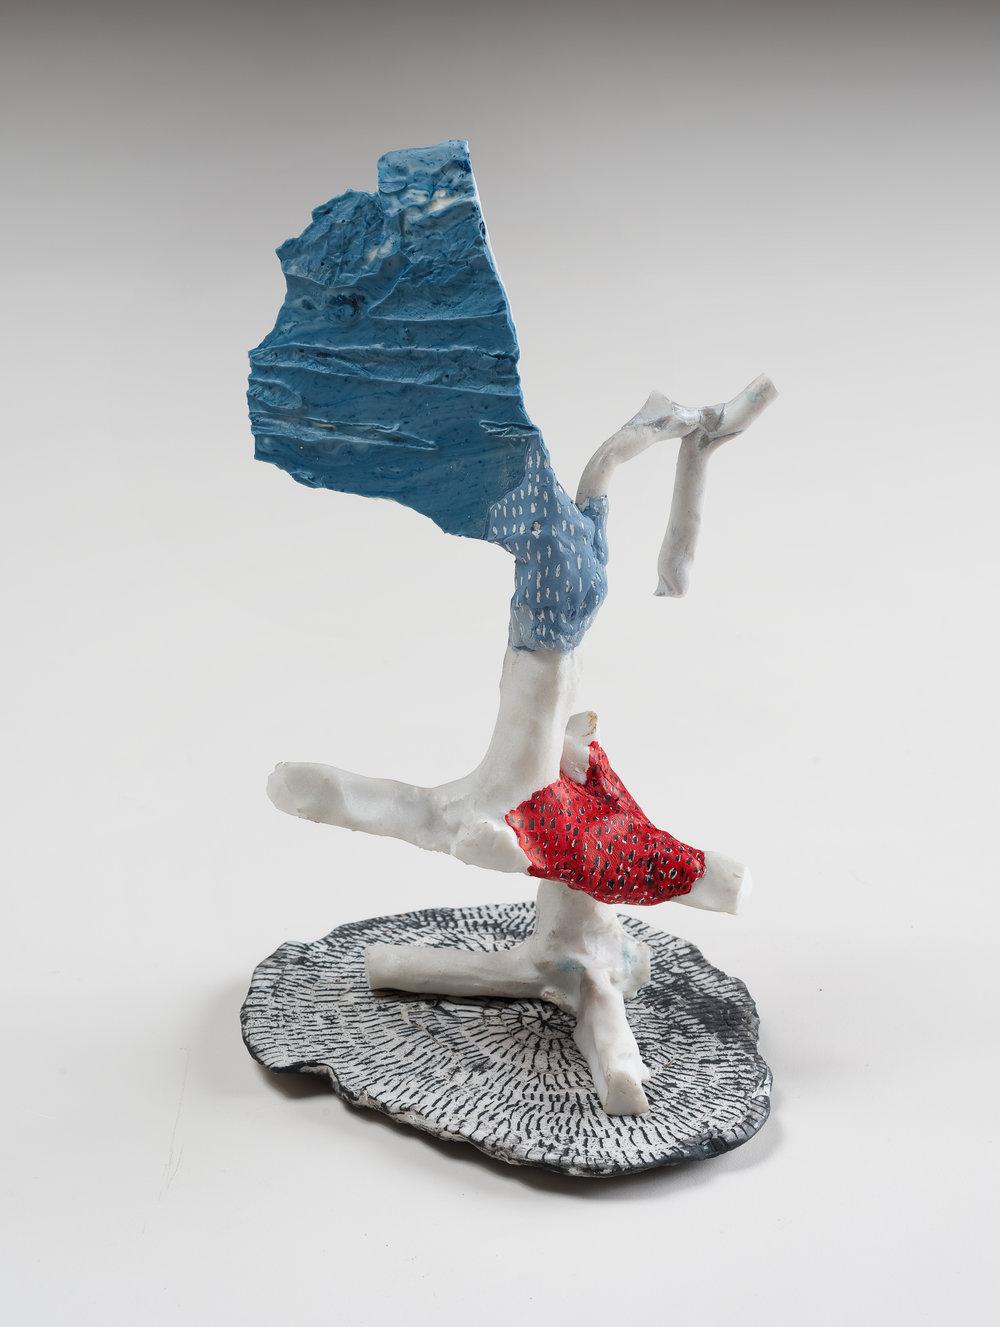 Salt Tree,  2013 porcelain, glaze, Magic Sculpt, ink 10 x 6.5 x 5 inches